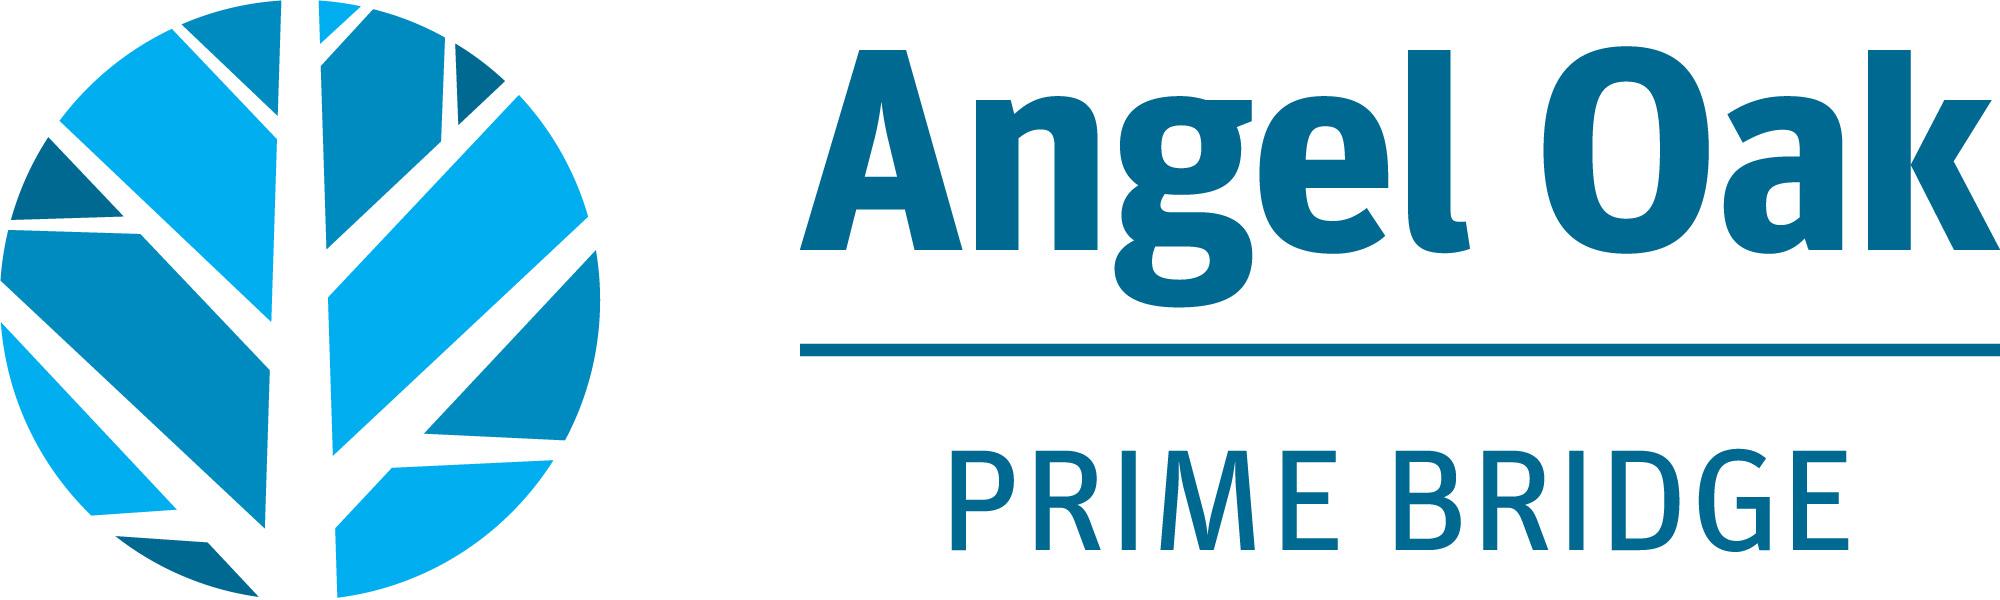 Angel Oak Prime Bridge